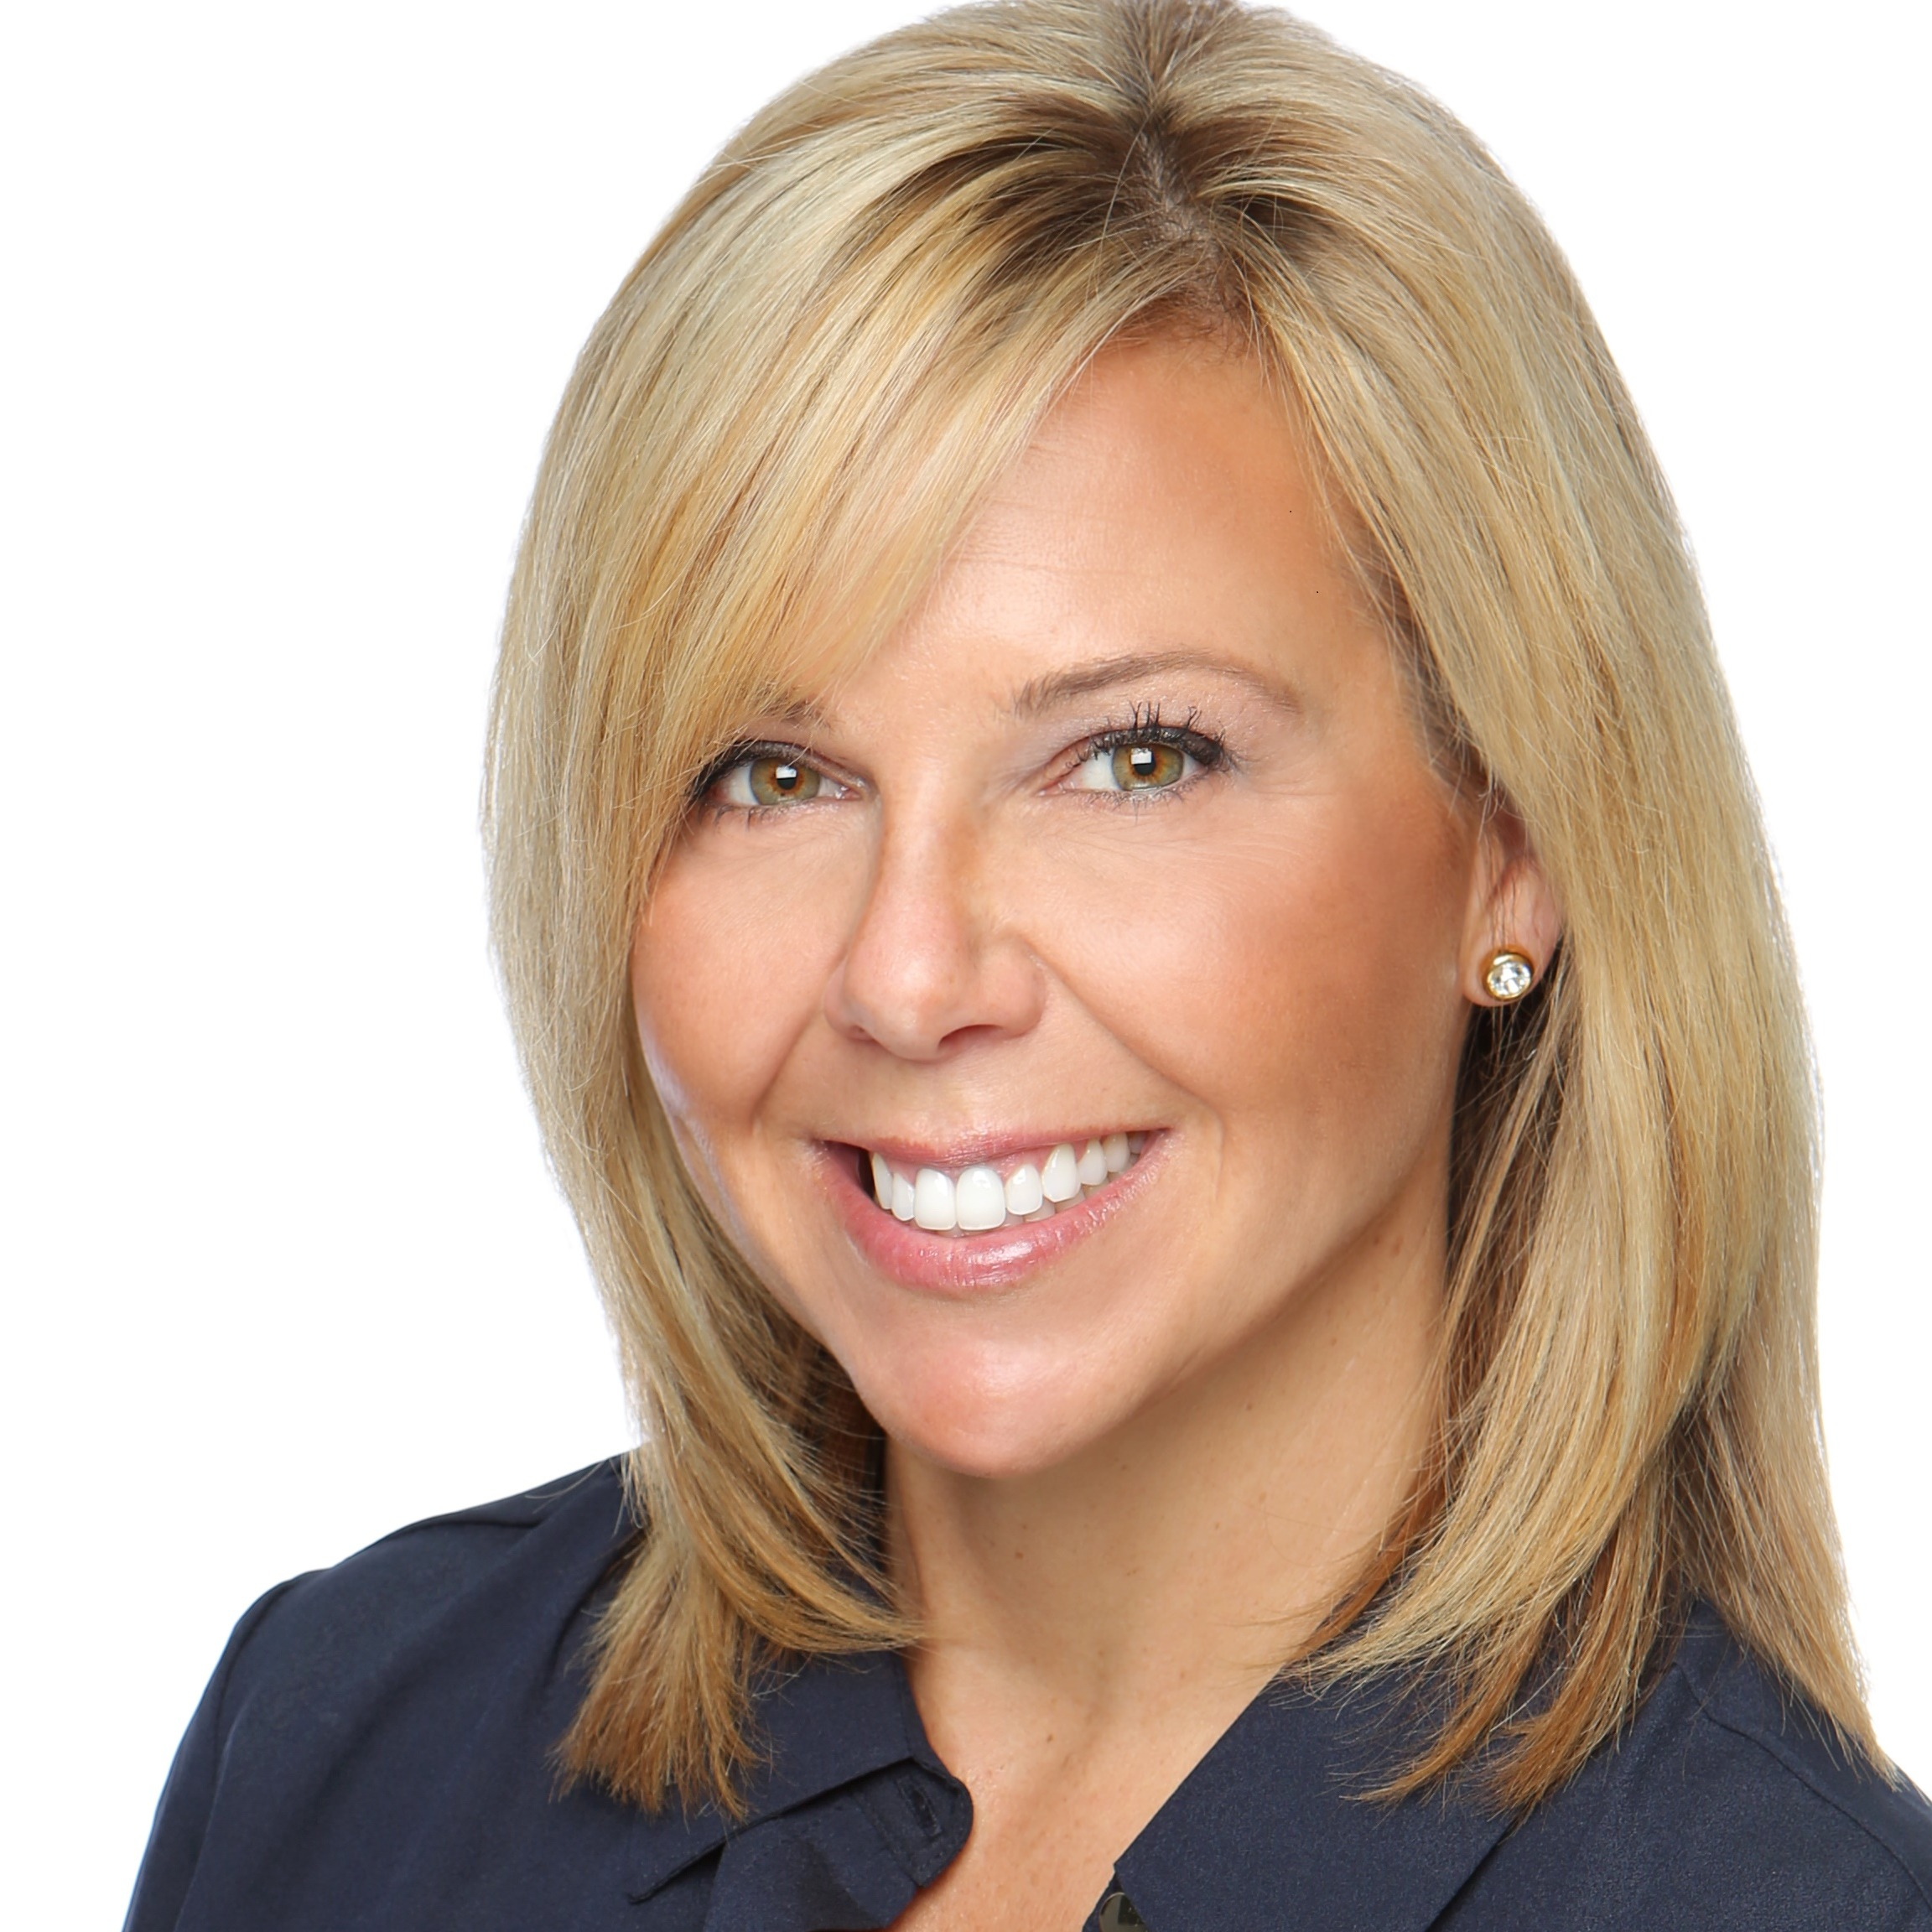 Jill Bentley